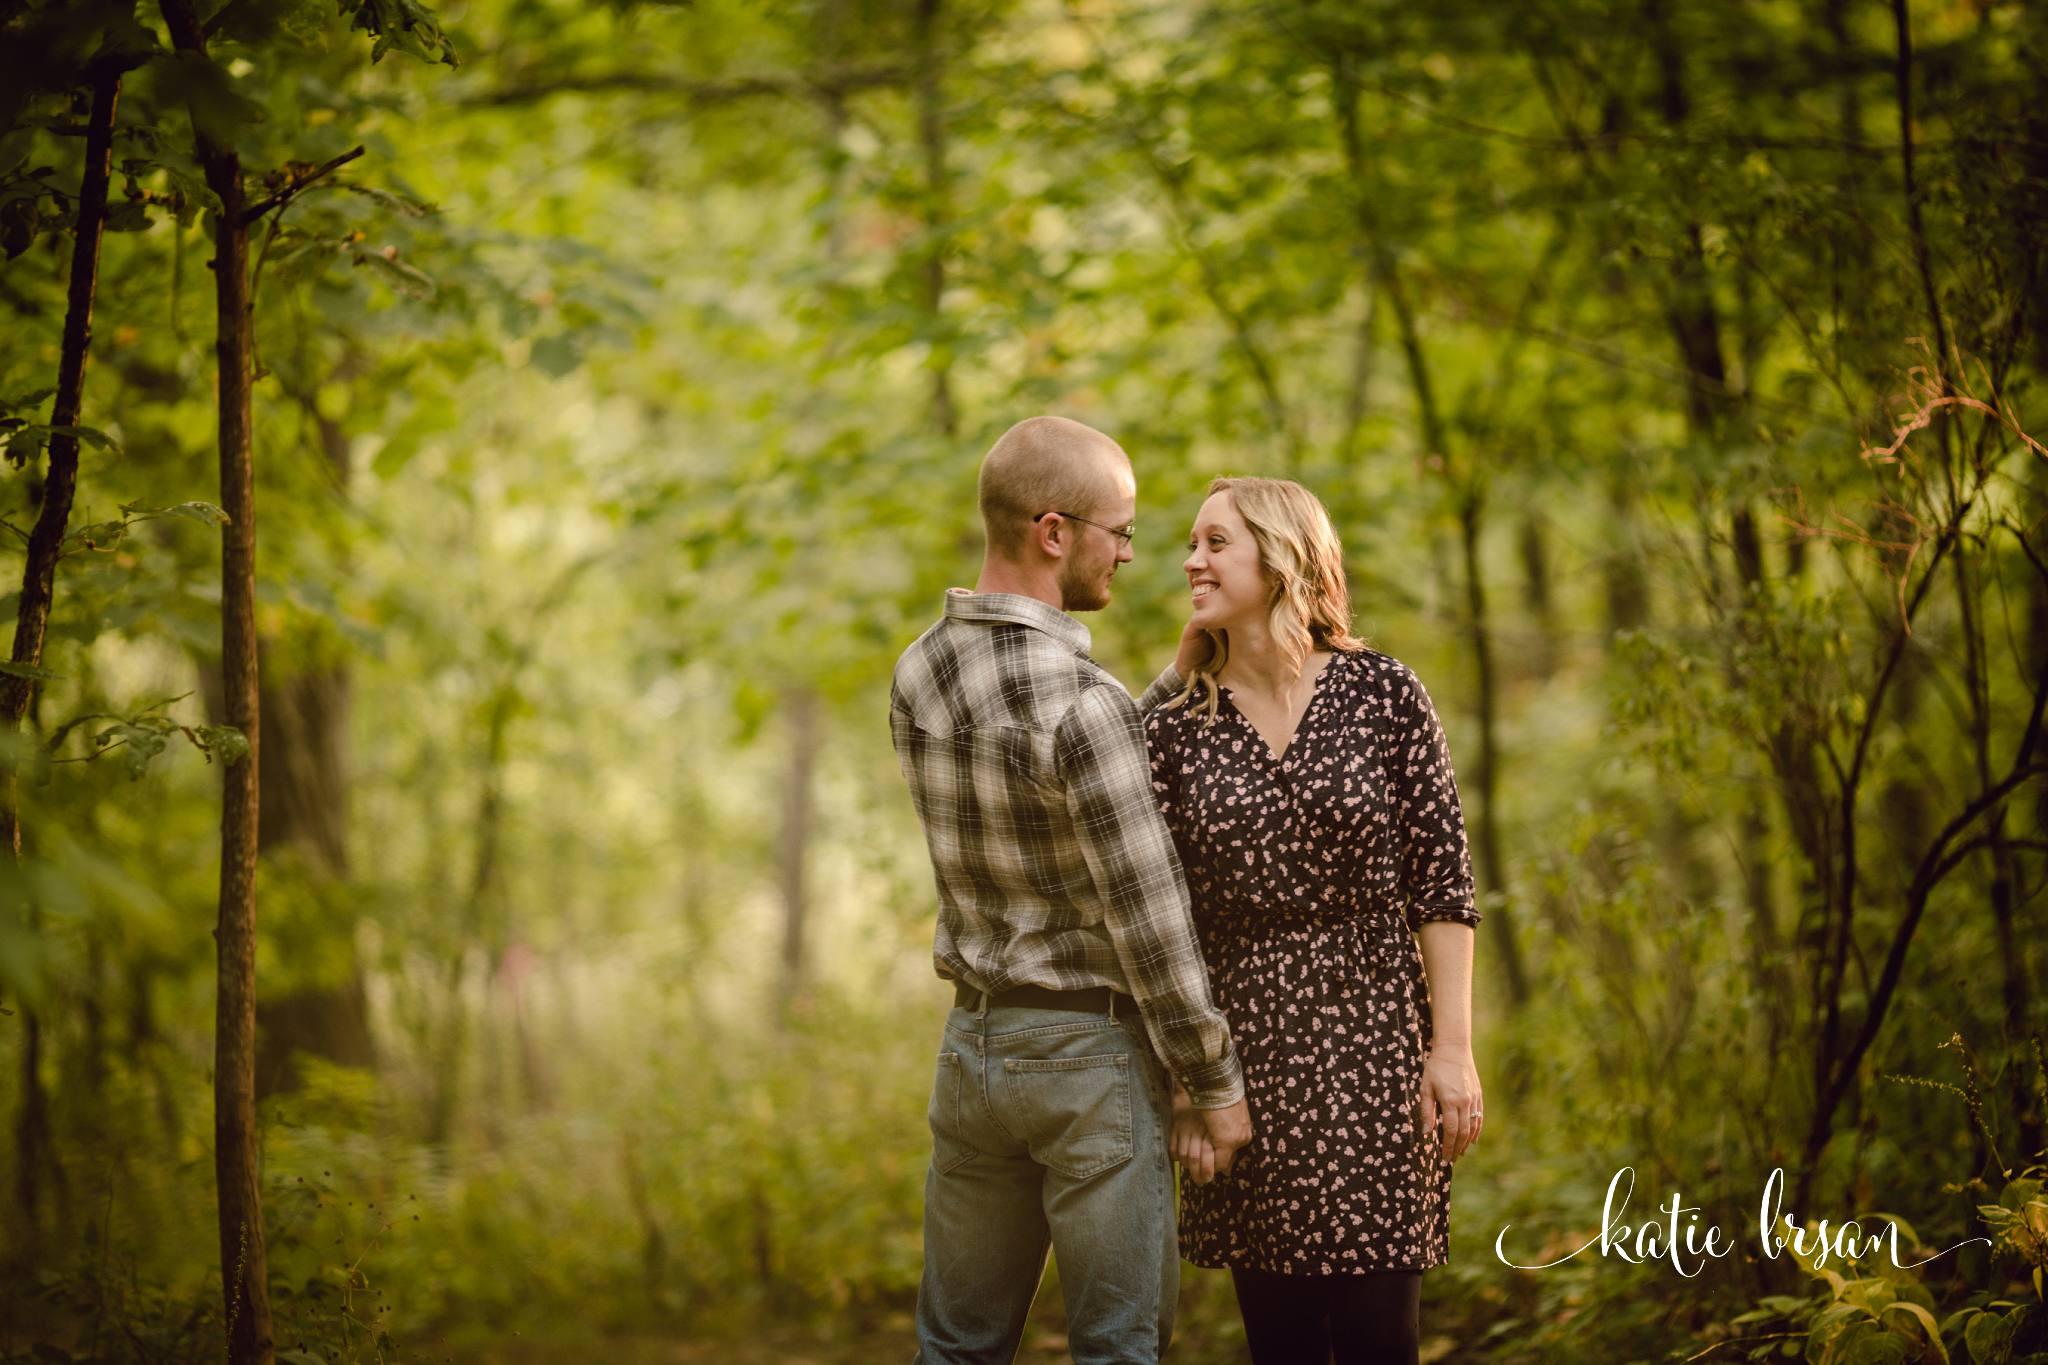 KatieBrsan-Frankfort-EngagementPhotos_0499.jpg